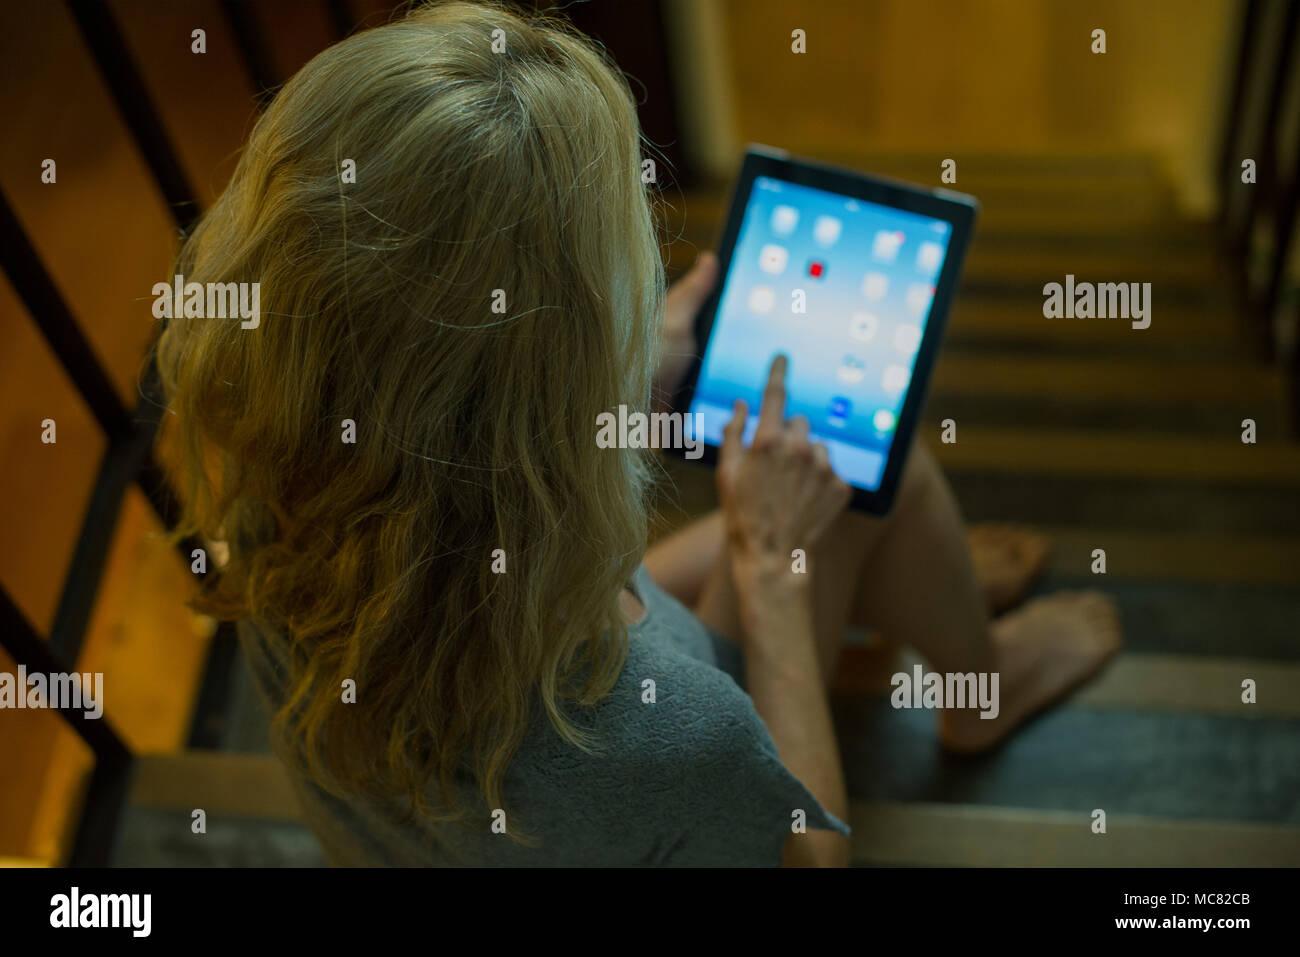 Frau mit digitalen Tablette zu Hause Stockbild